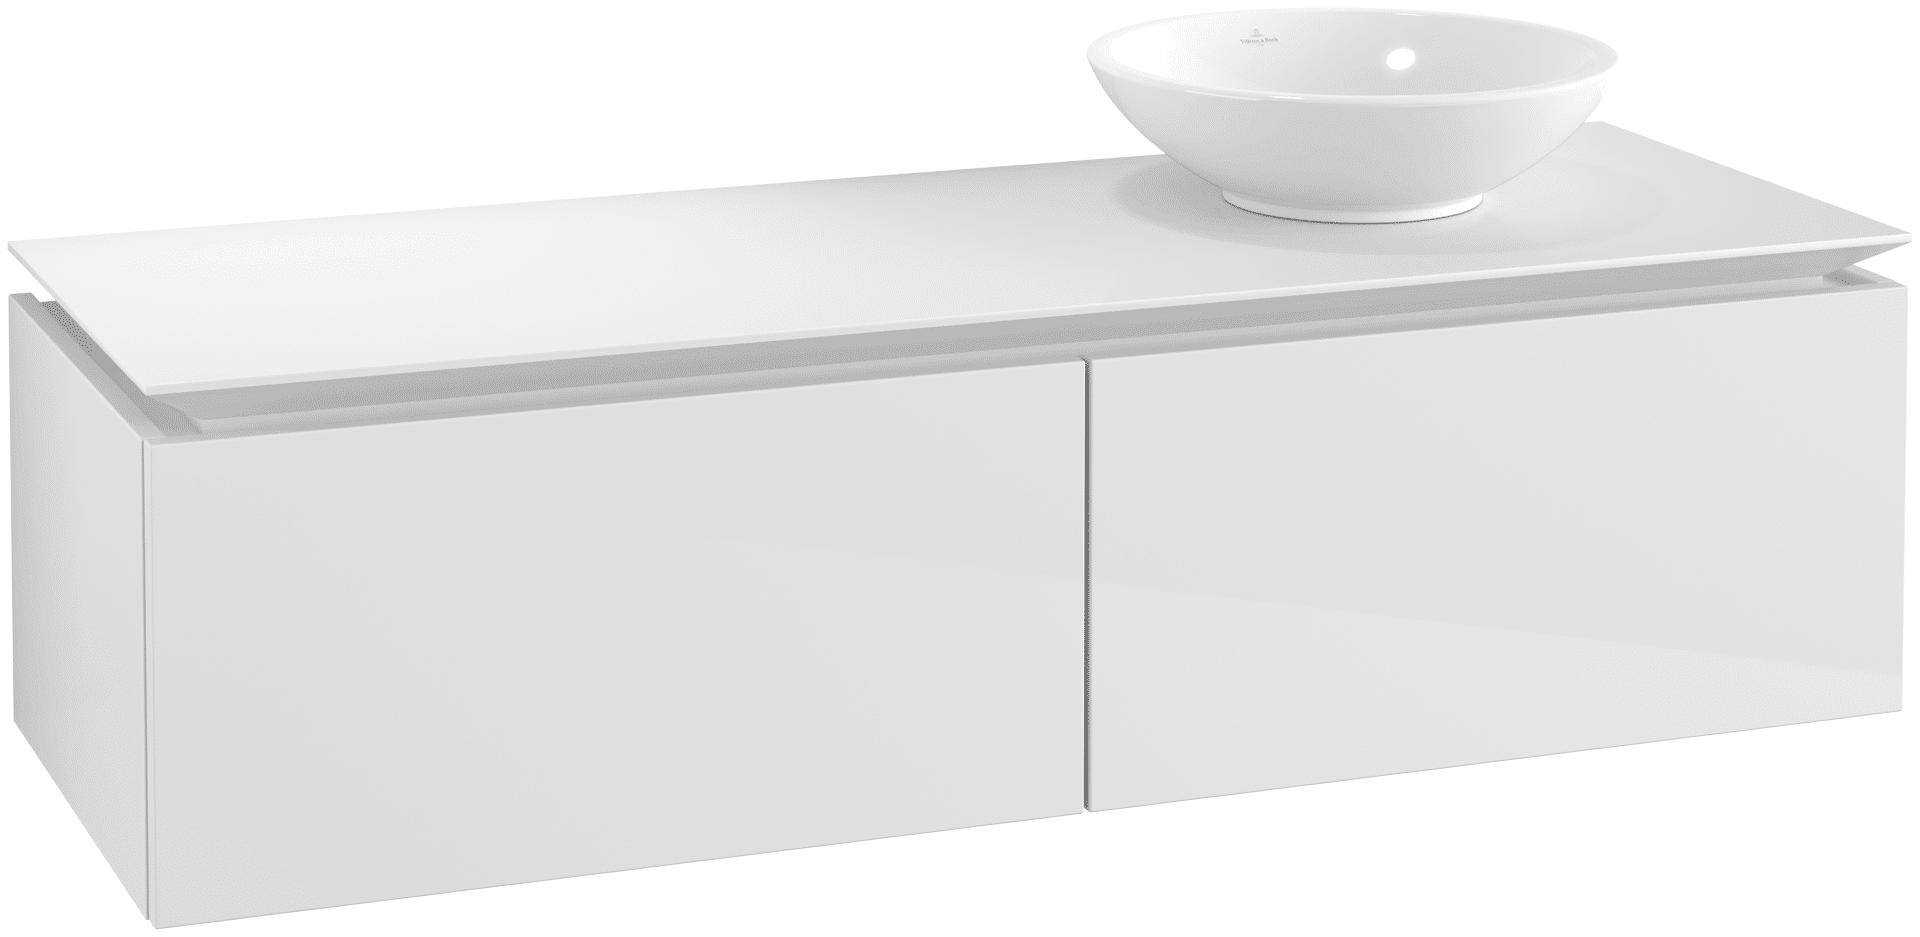 Villeroy & Boch Villeroy & Boch Legato - Meuble sous lavabo with 2 drawers & 1 cut-out right 1400 x 380 x 500mm blanc lustré